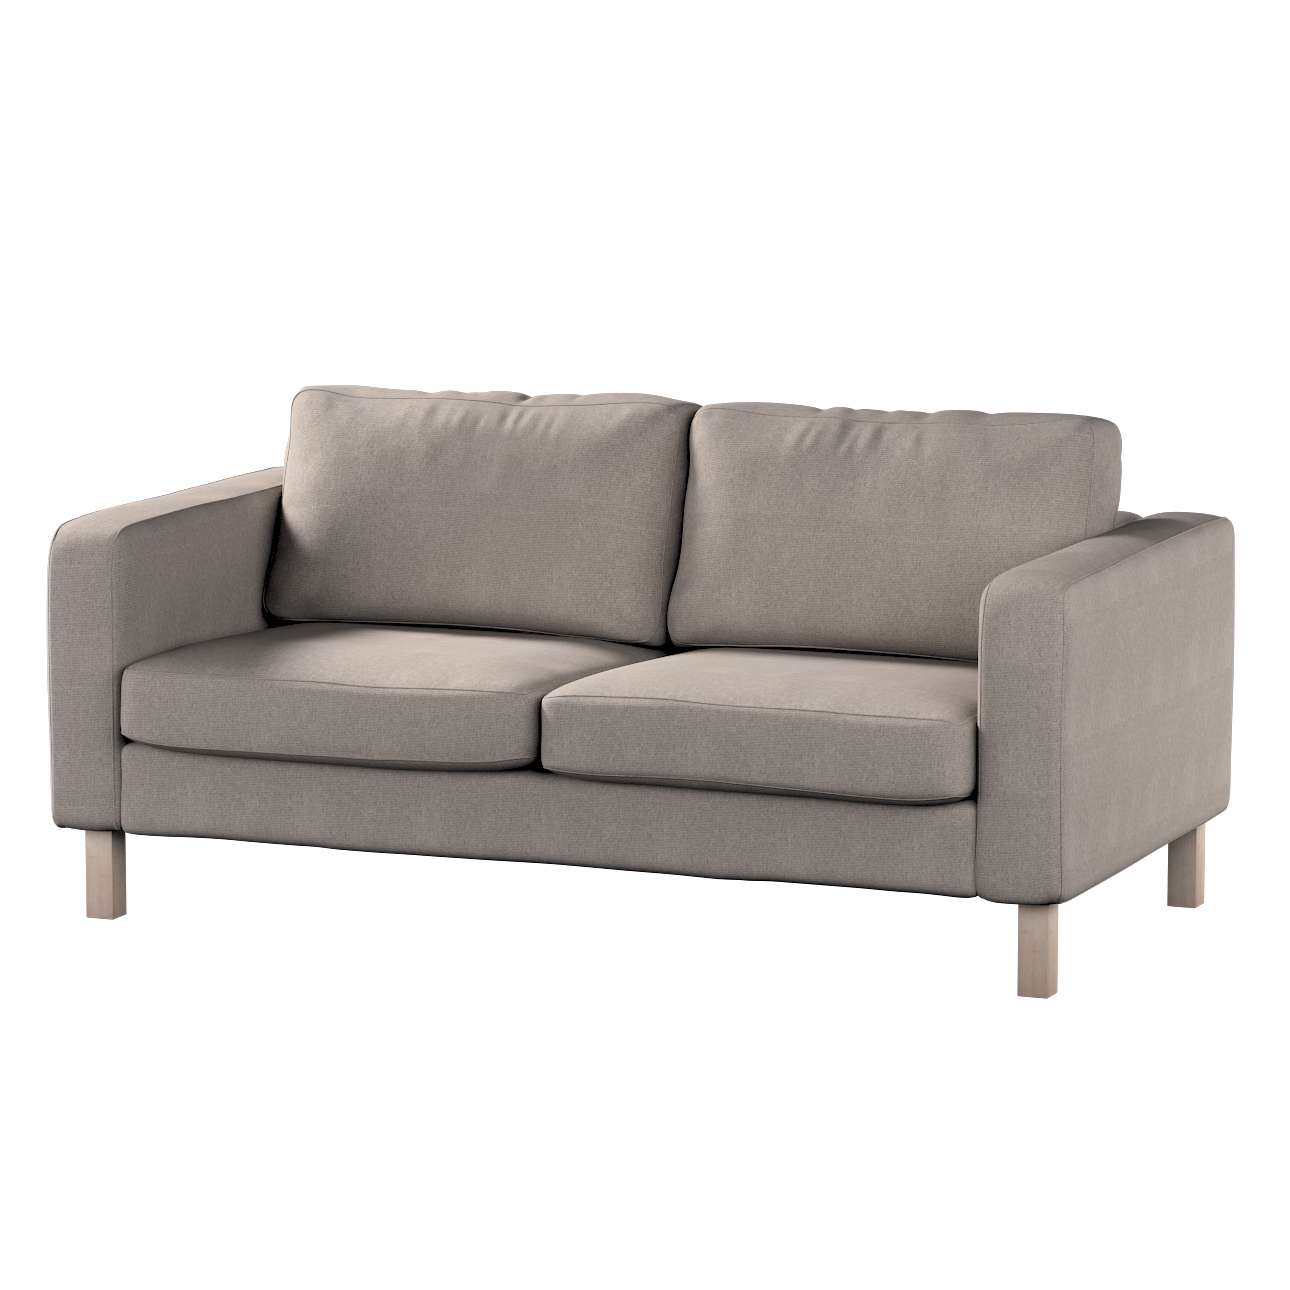 KARSLTAD dvivietės sofos užvalkalas Karlstad 2-vietės sofos užvalkalas kolekcijoje Etna , audinys: 705-09